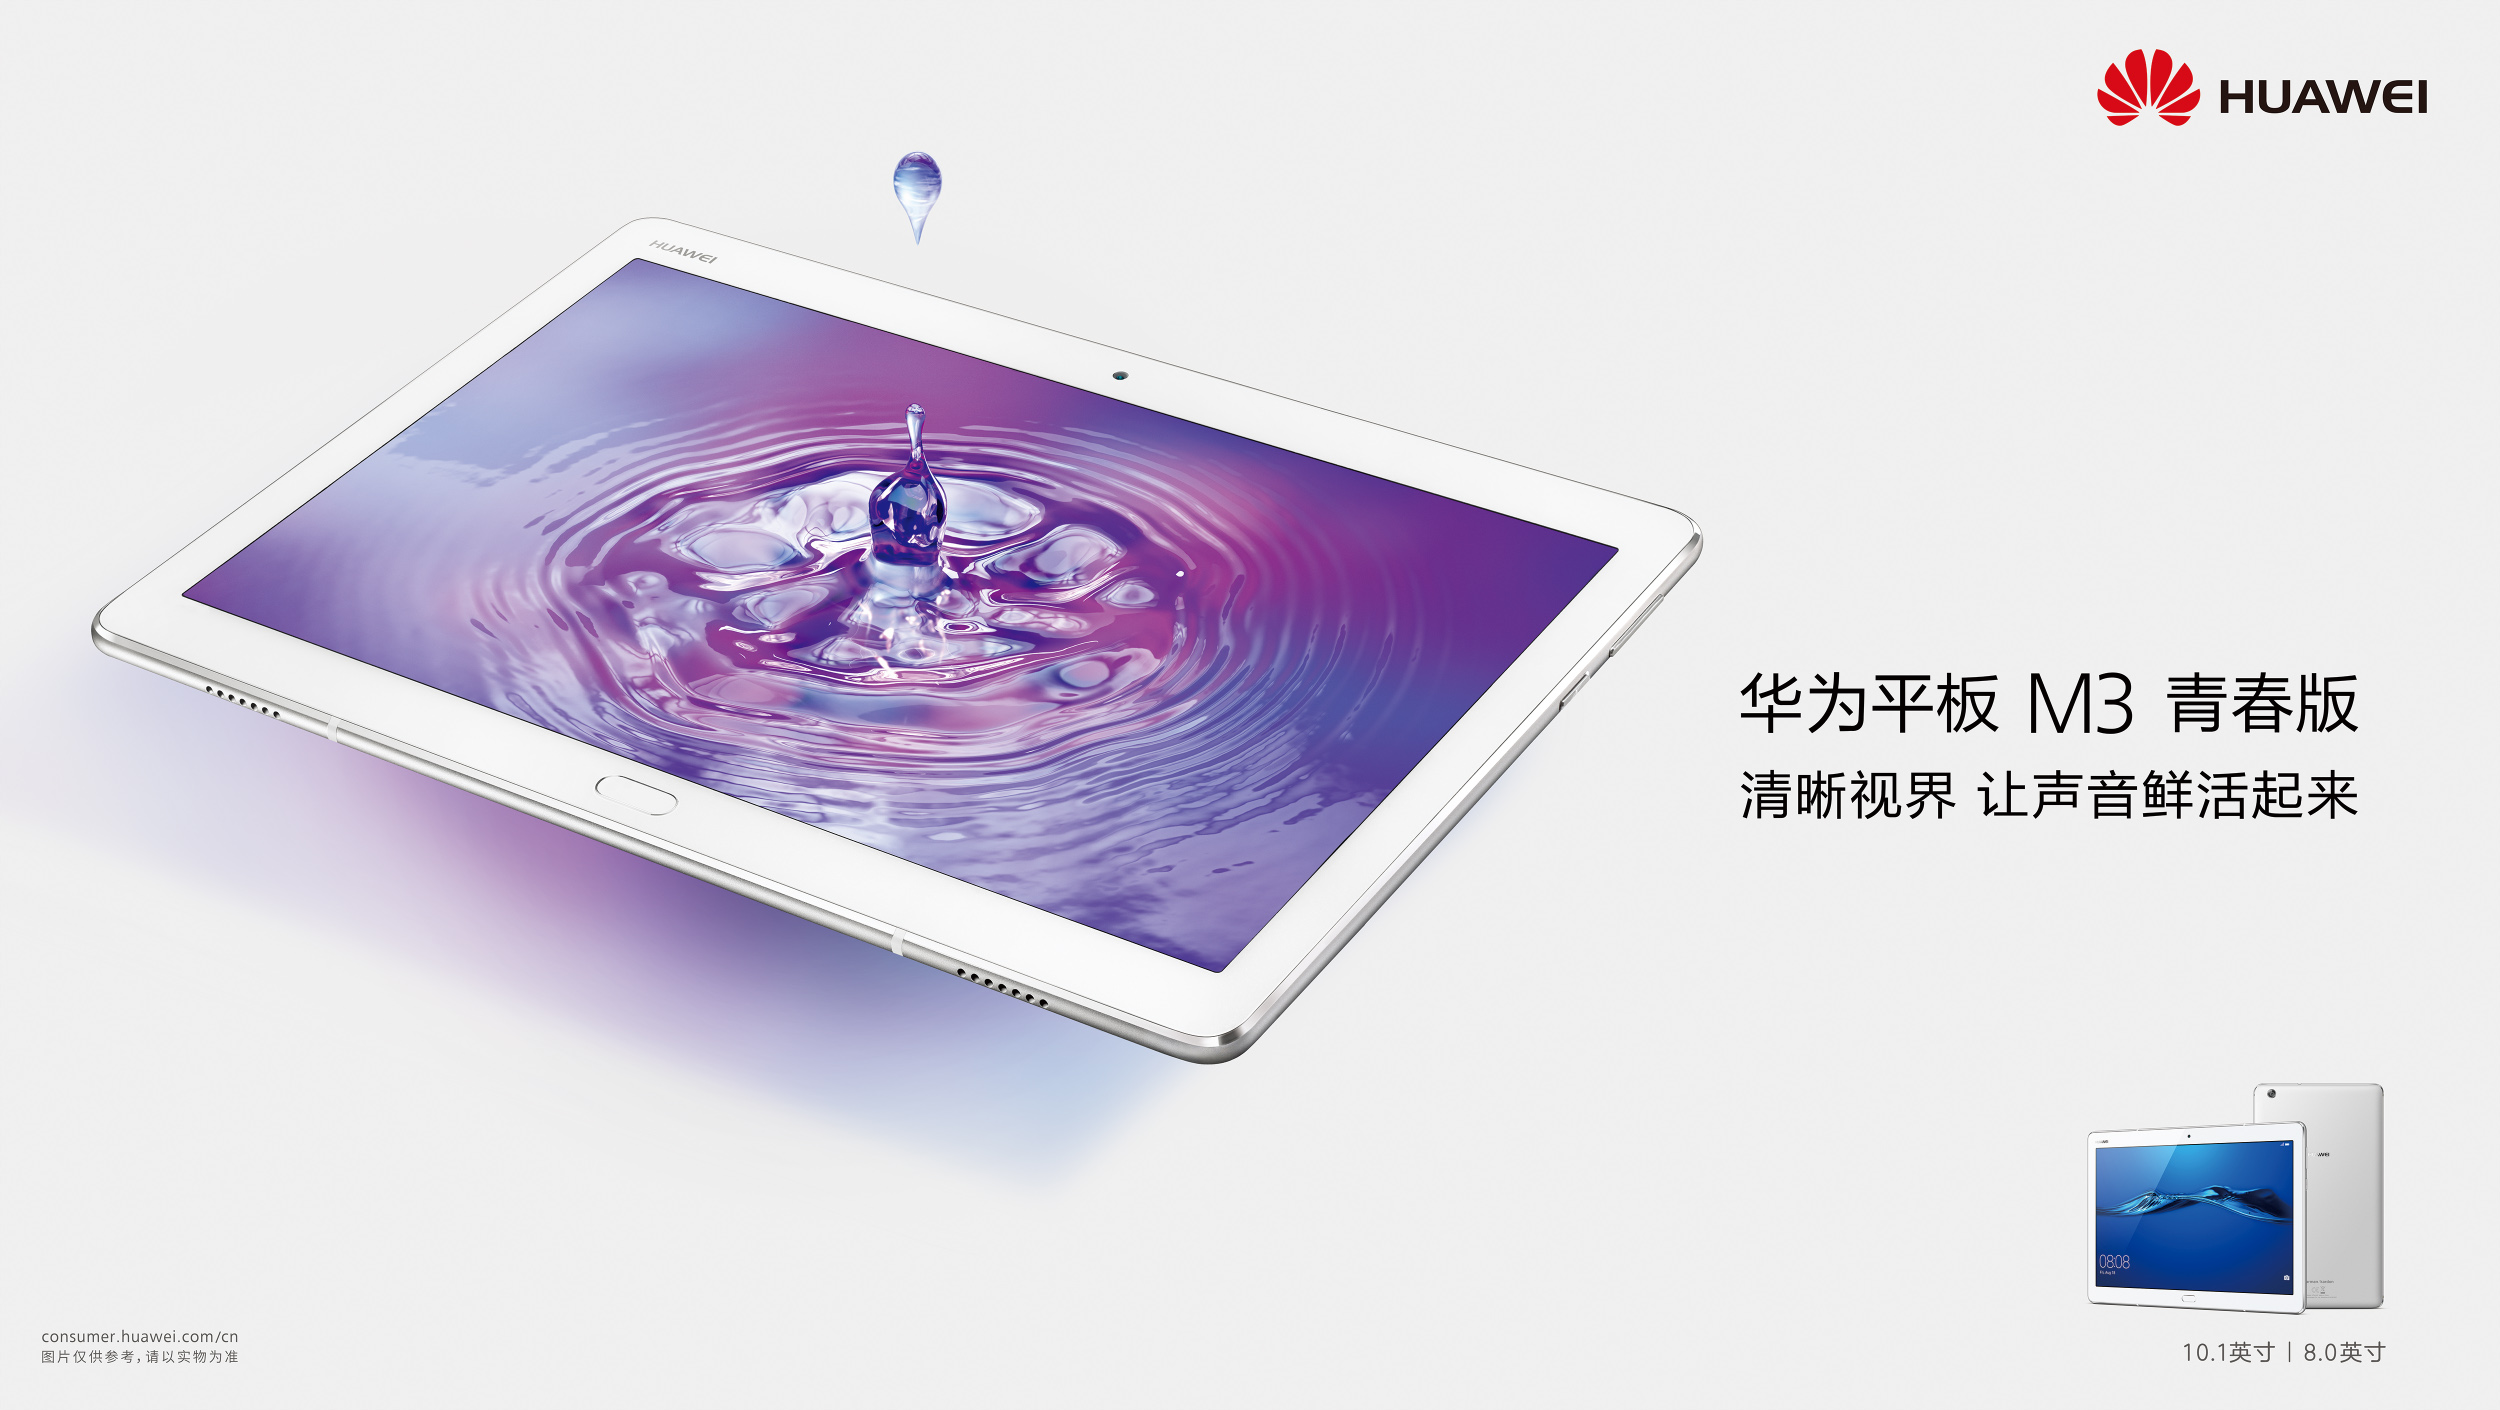 Huawei_M3_Waterdrop